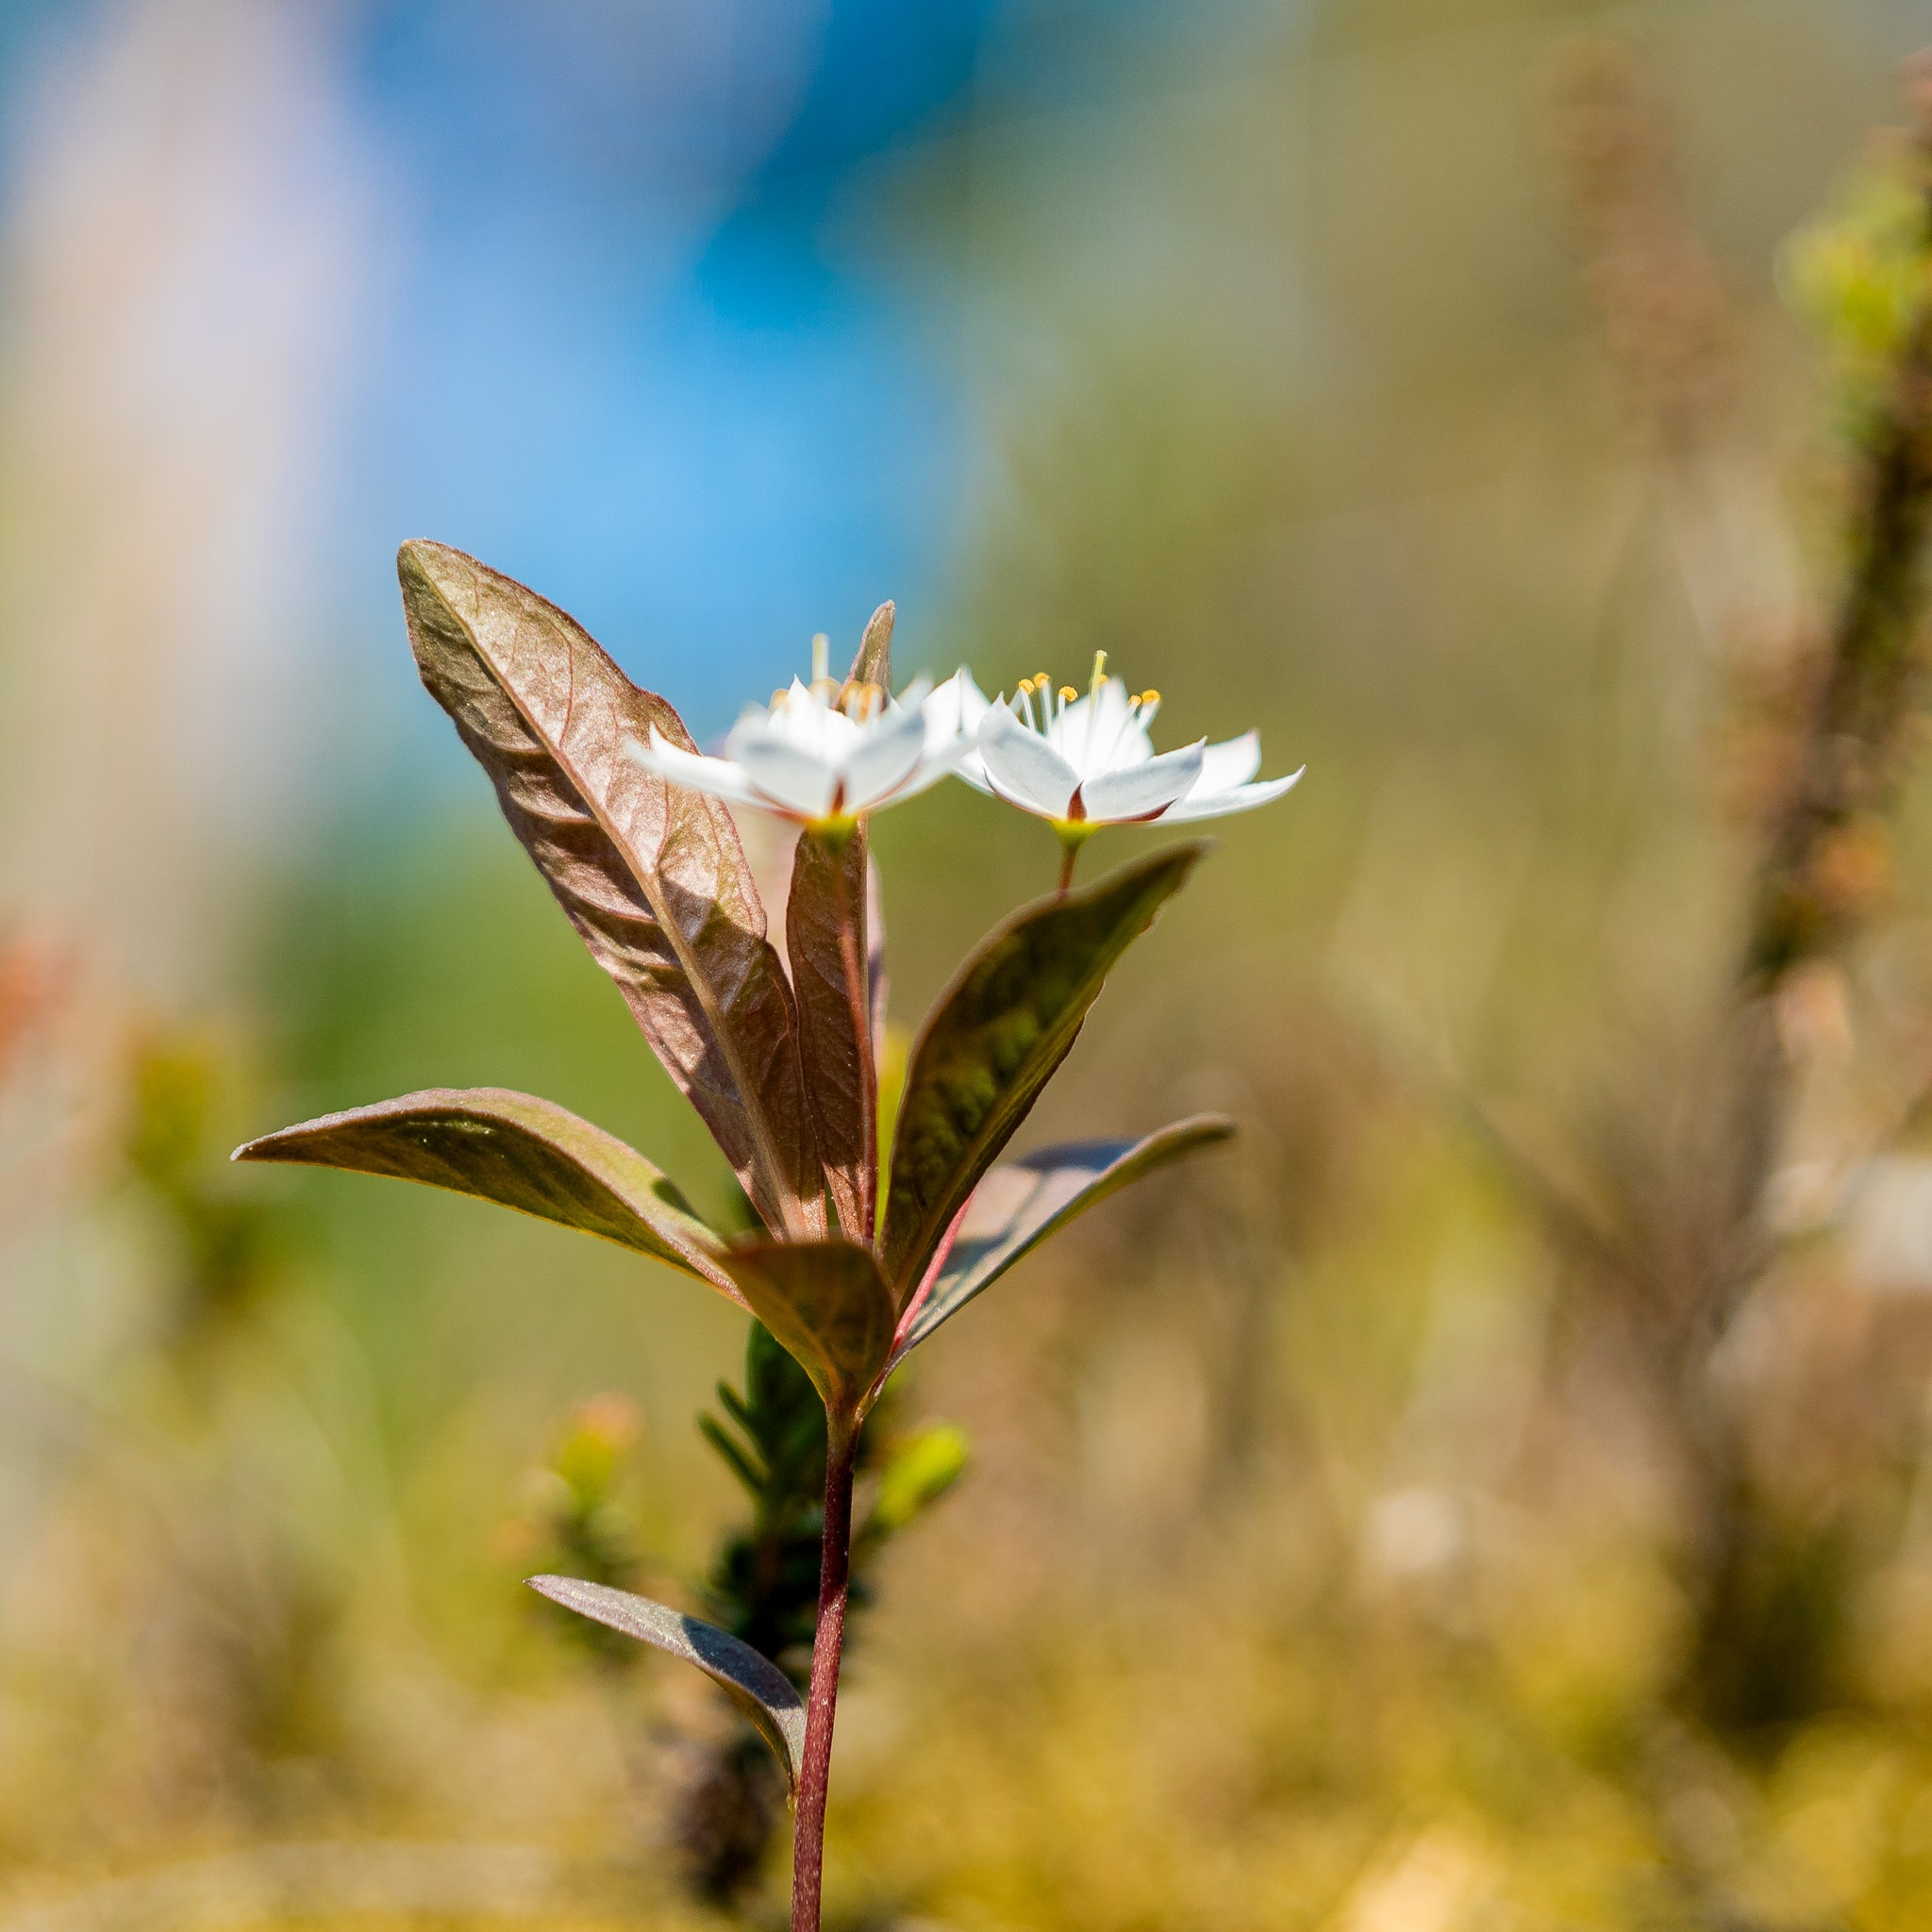 Flower by Tormod Lindoe